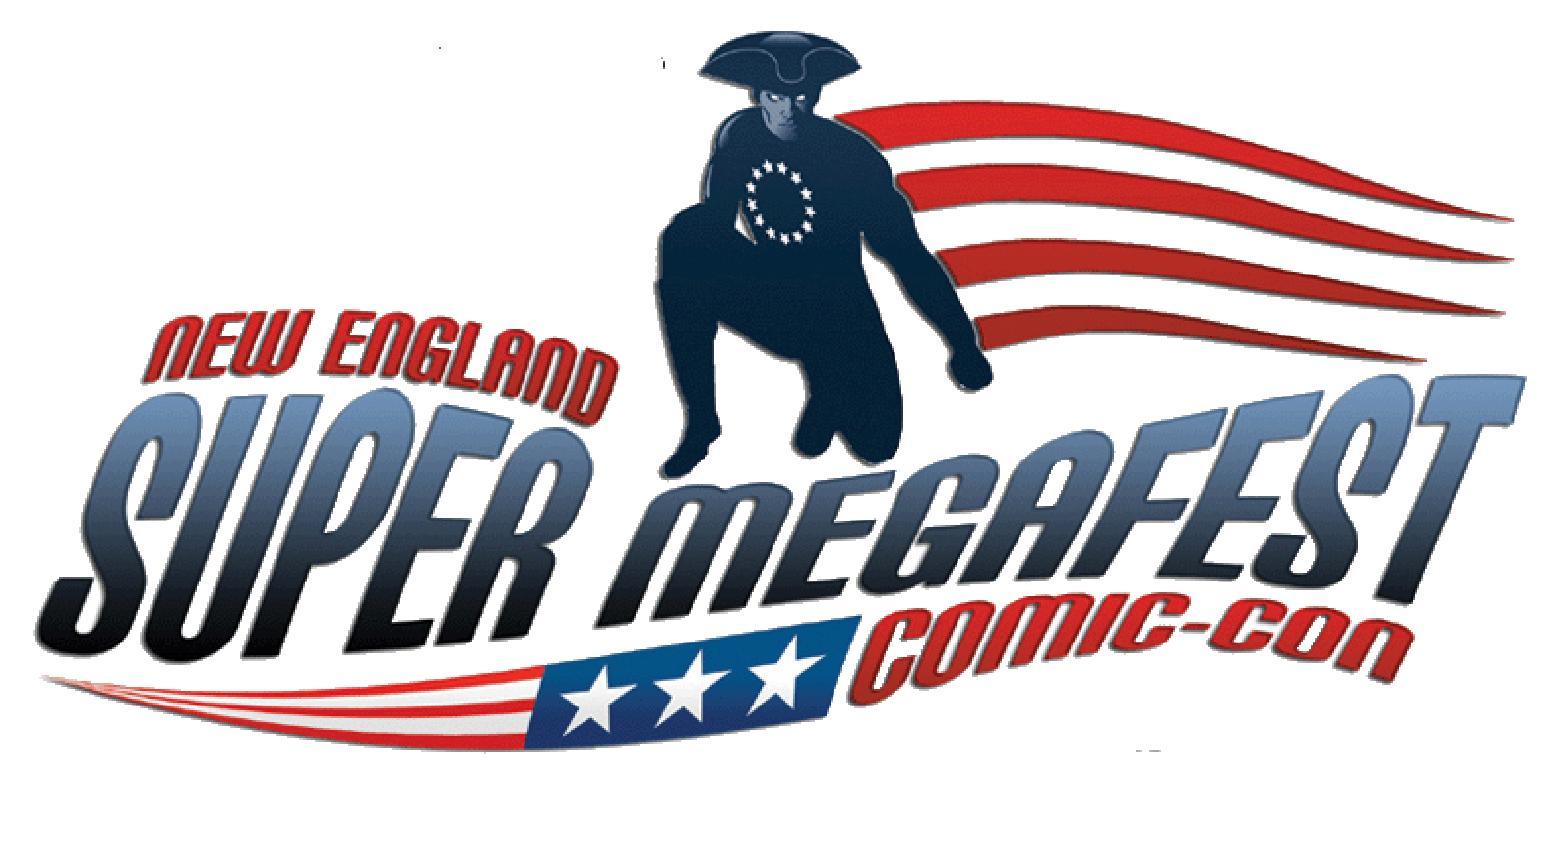 NEW ENGLAND SUPER MEGA FEST